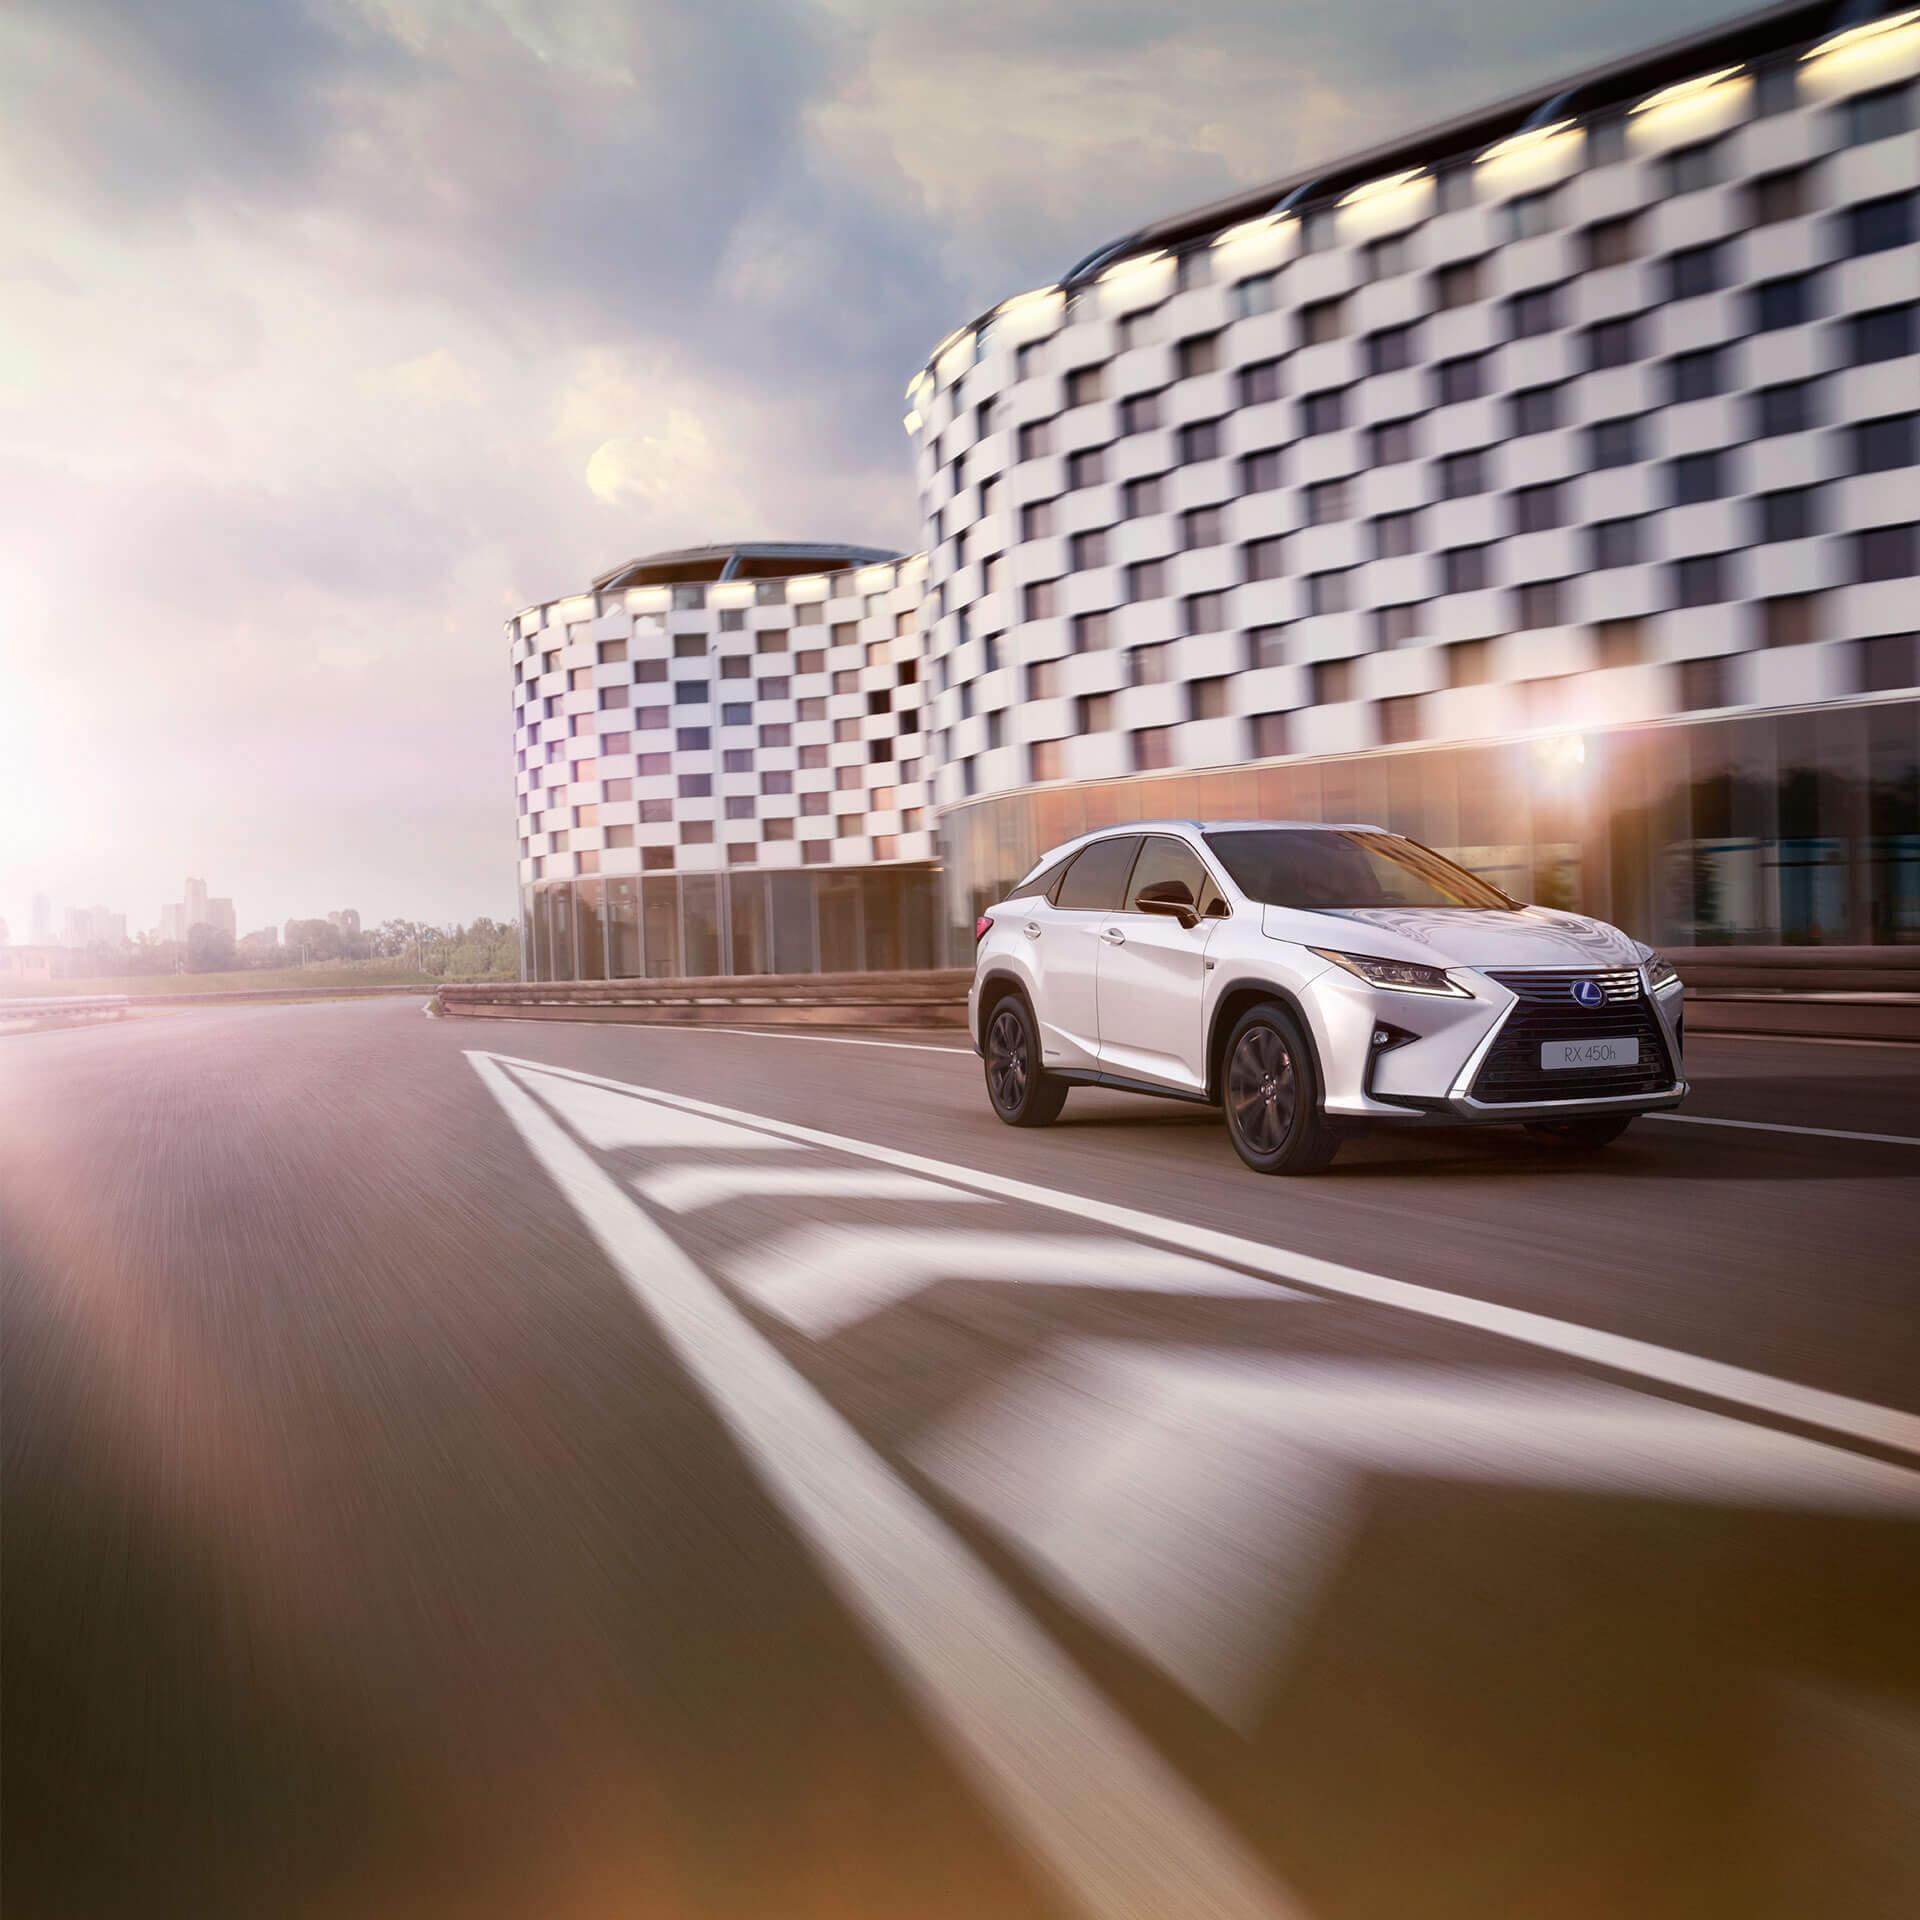 Lexus Extended Warranty: Lexus Europe